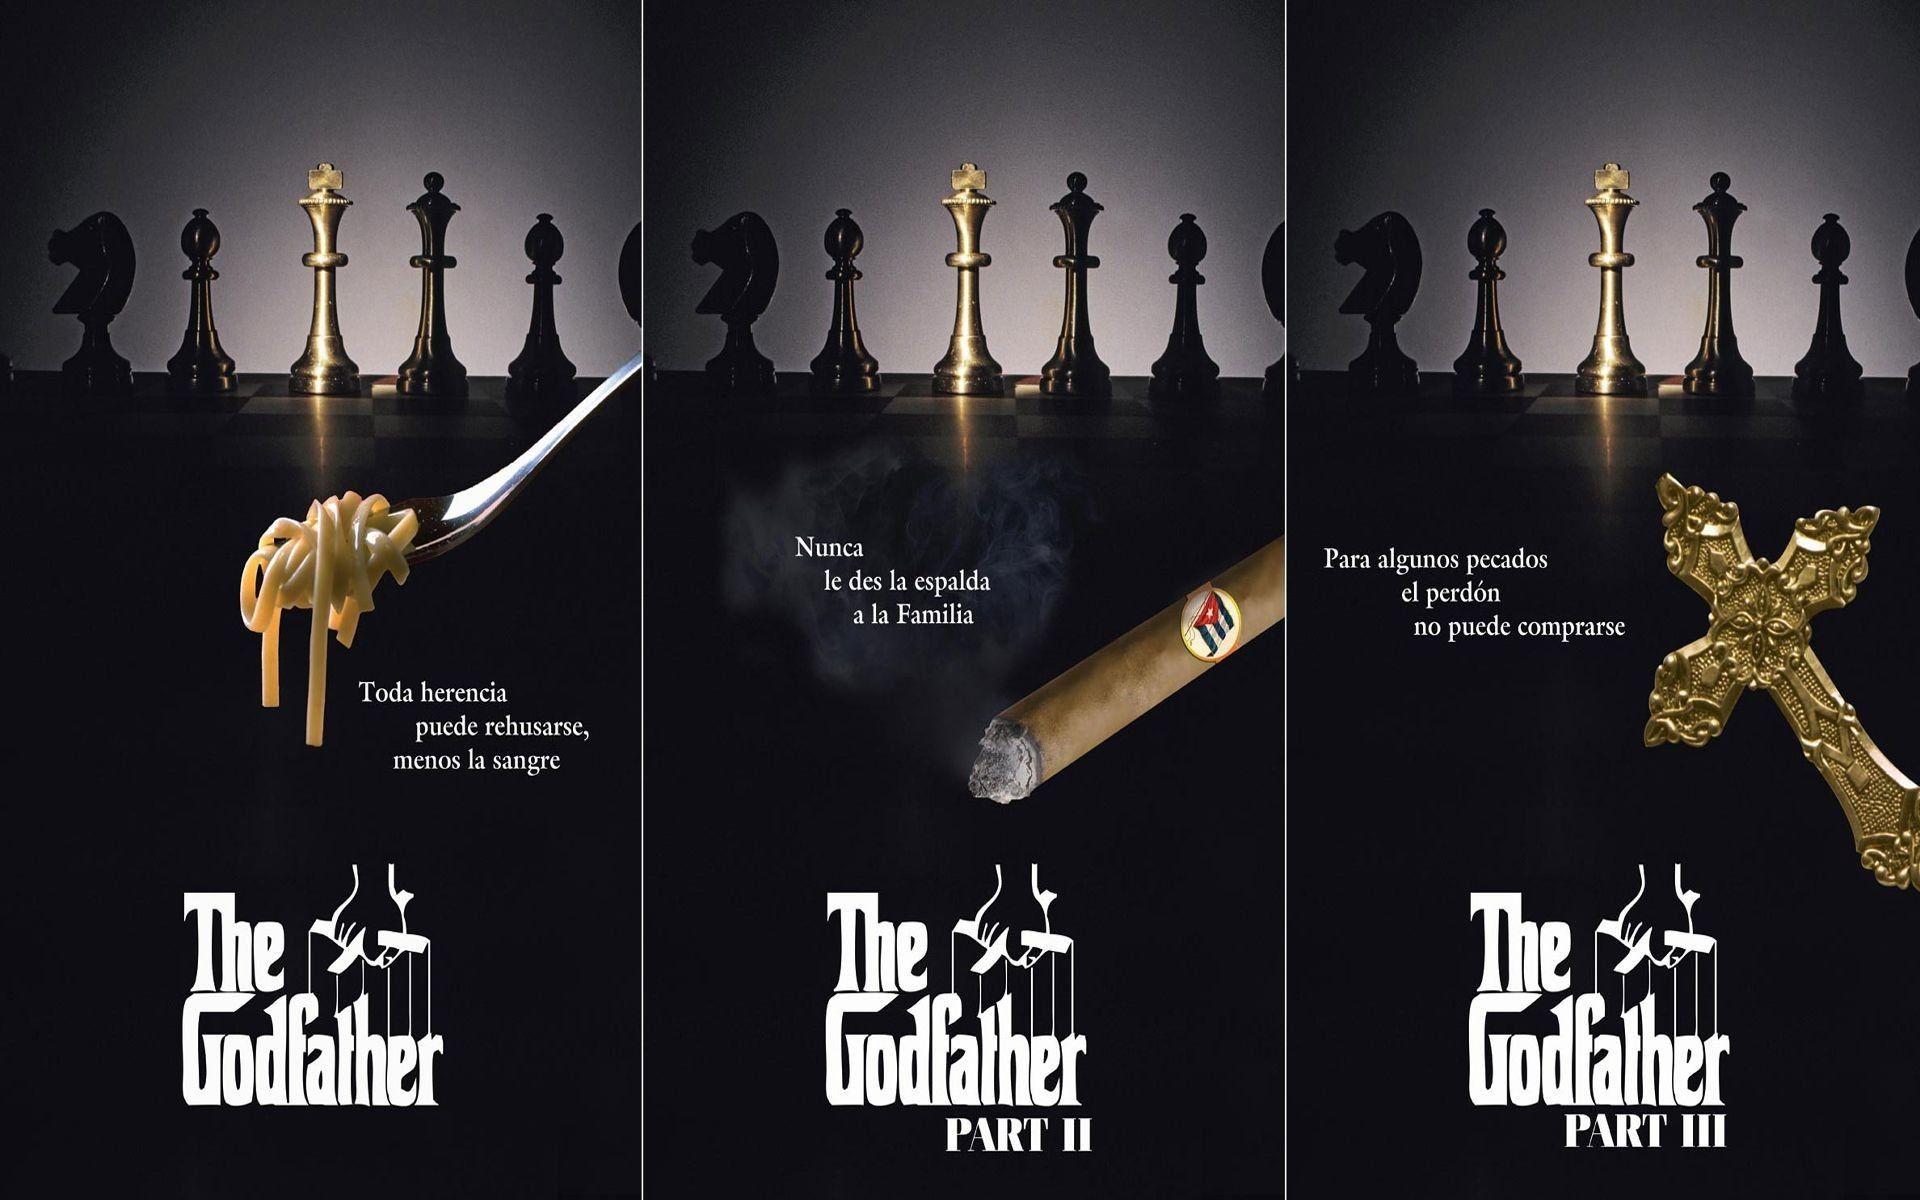 The Godfather Wallpaper Hd   Data-src - Godfather Wallpaper Iphone 7 - HD Wallpaper